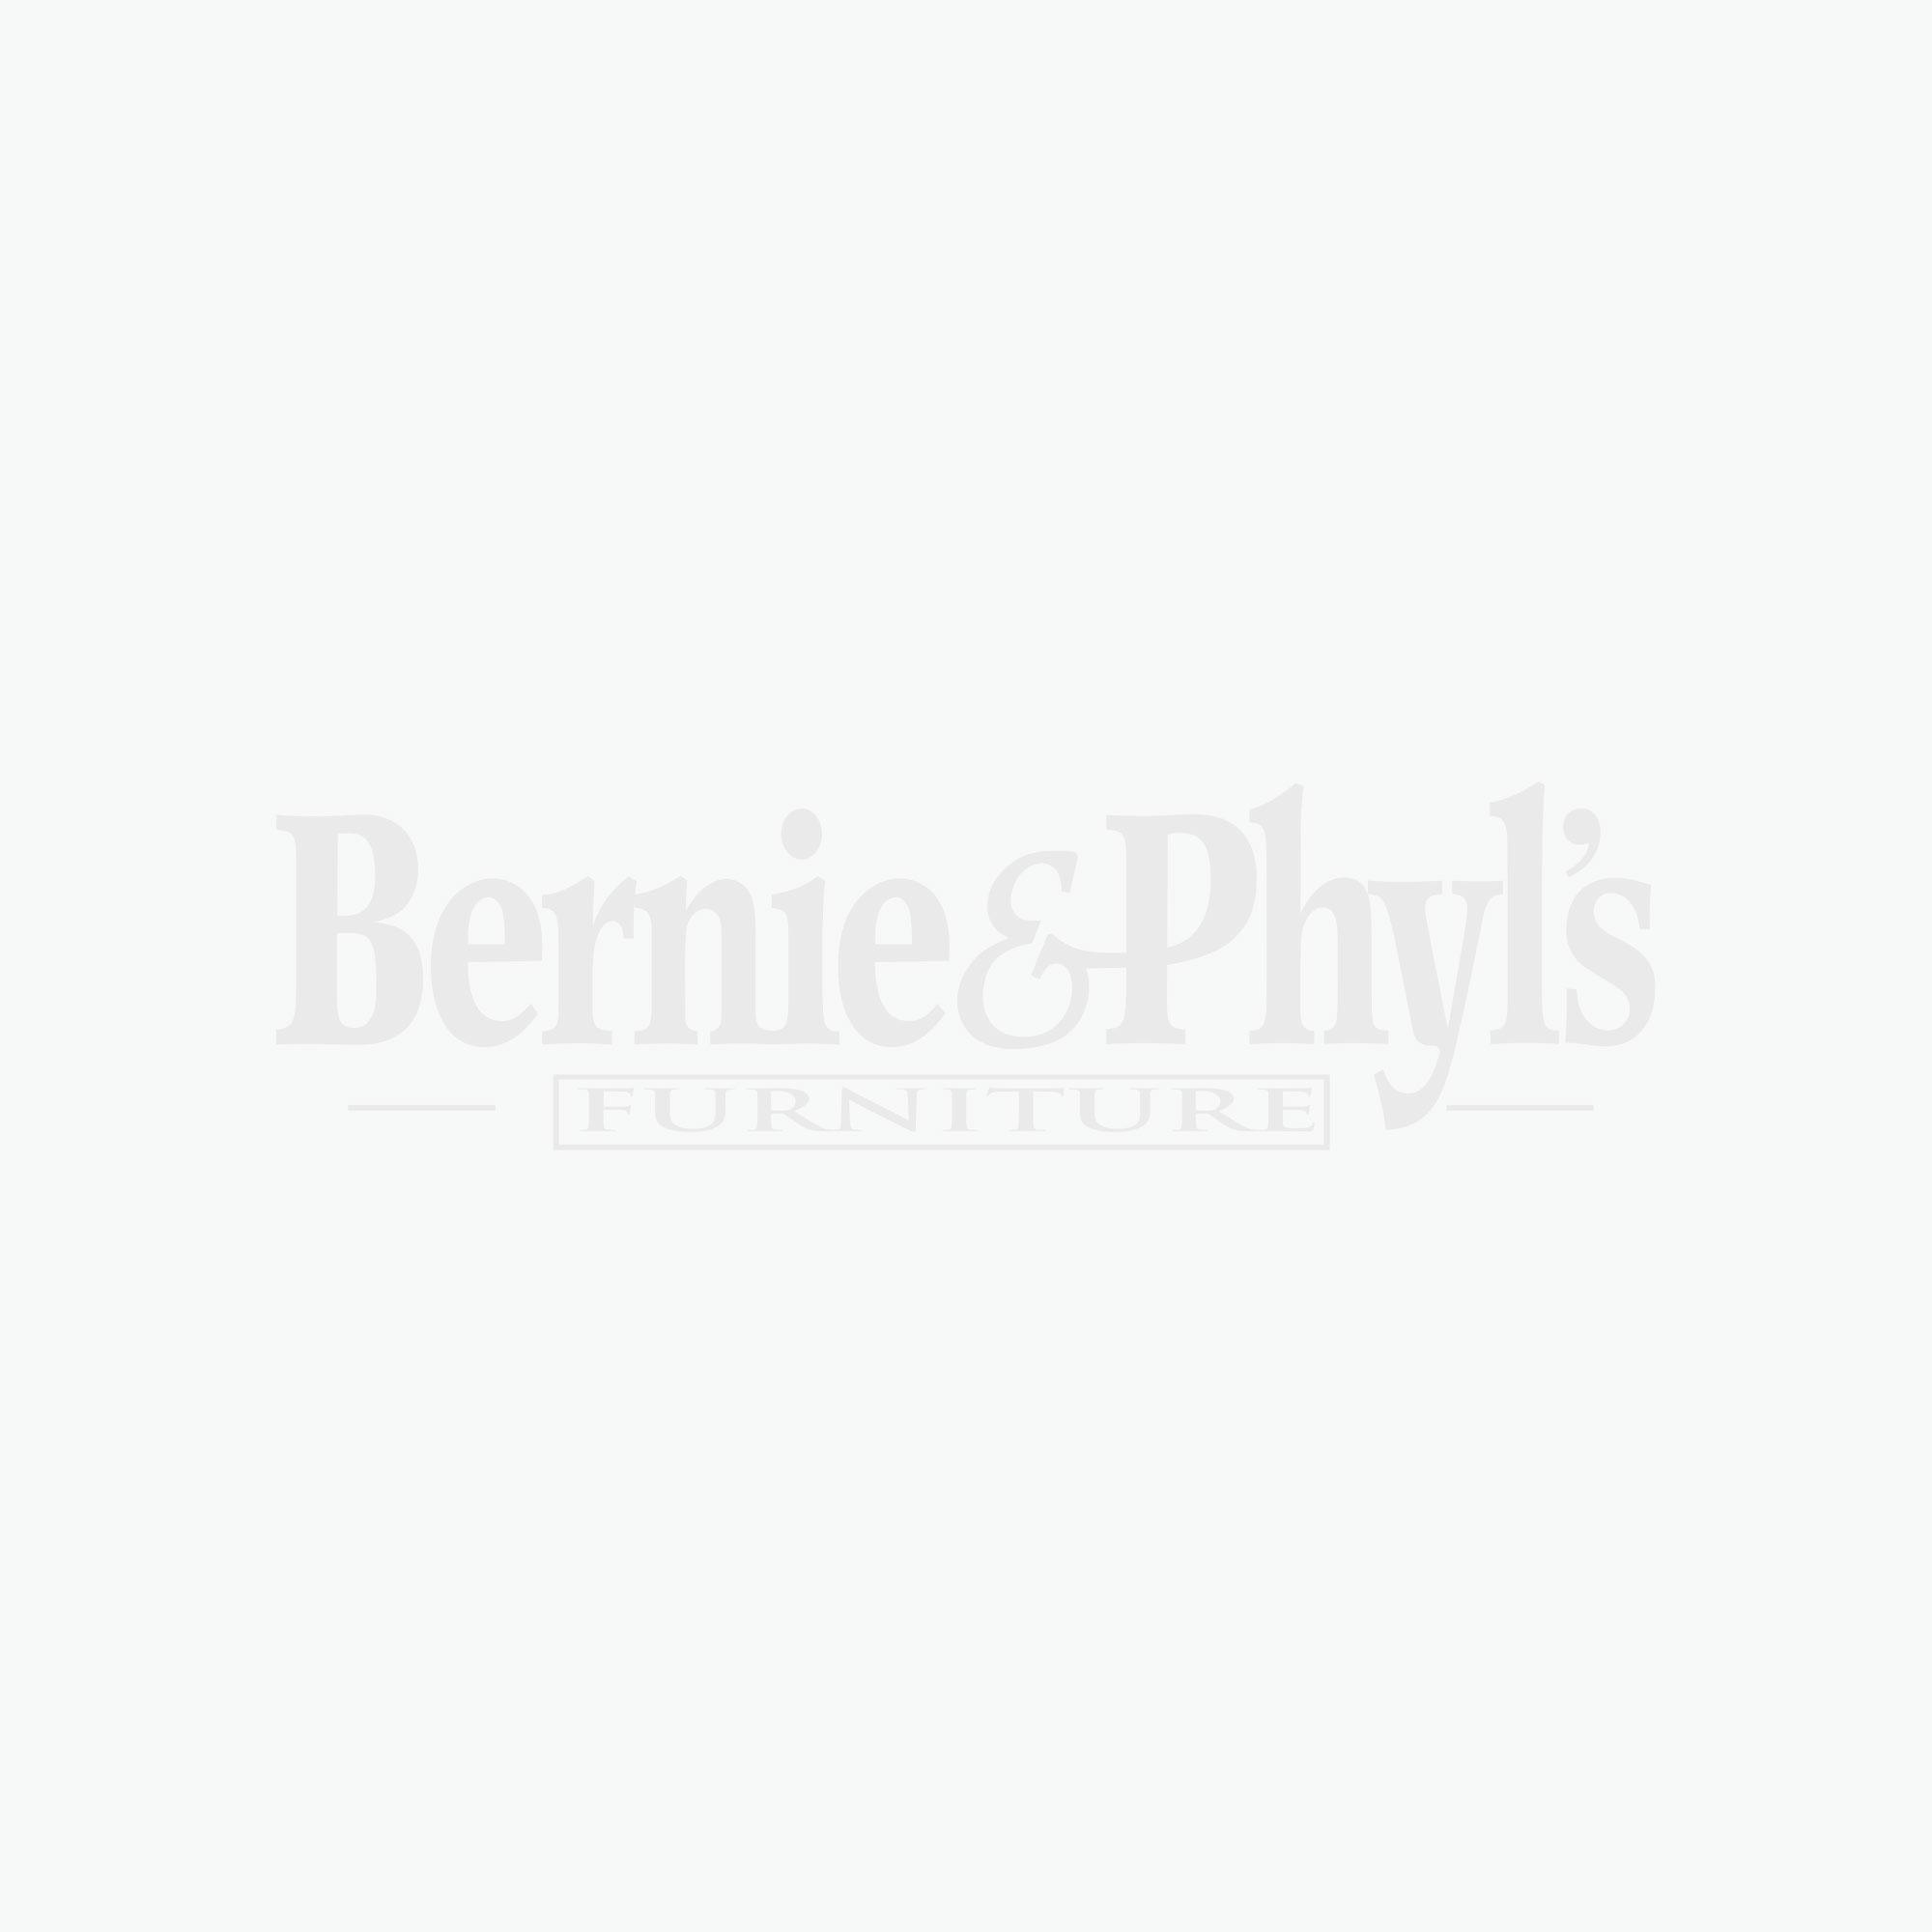 Florentown Rectangular End Table - Dark Brown - (Set of 1) - T840-3 by Ashley Furniture Signature Design